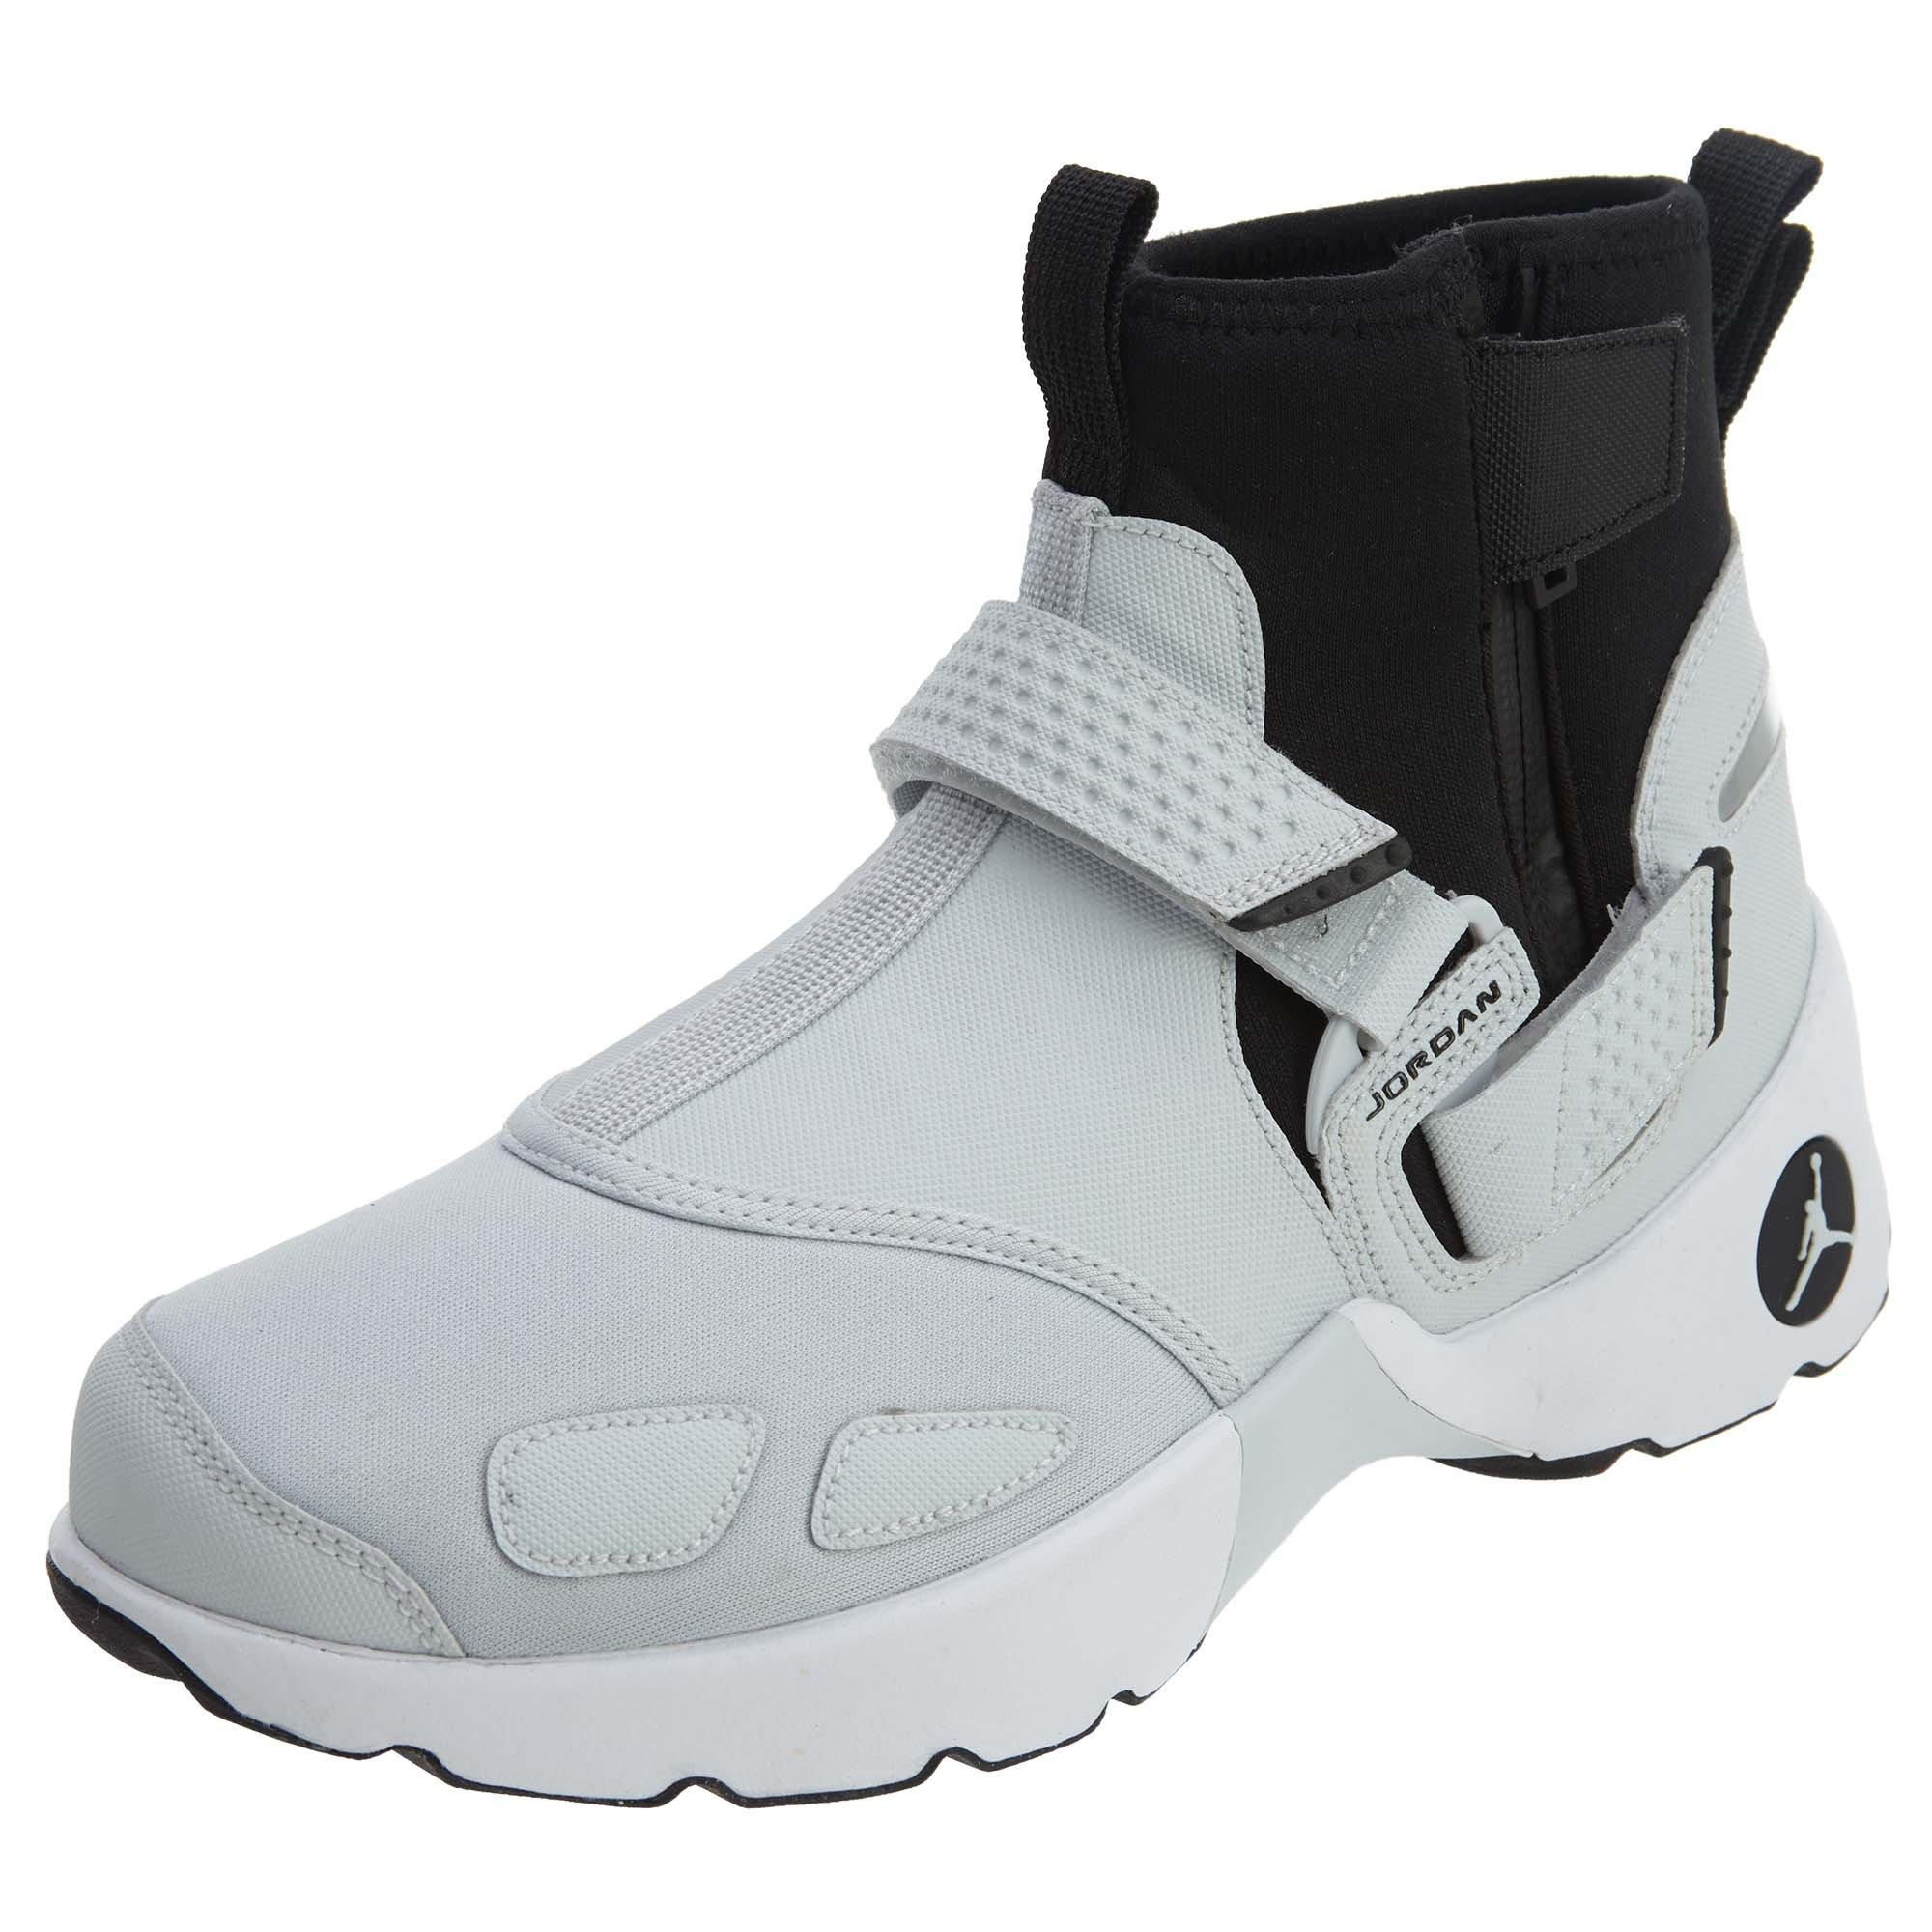 Nike Mens Jordan Trunner LX High Boots Pure Platinum/Black AA1347-002 Size 9.5 by NIKE